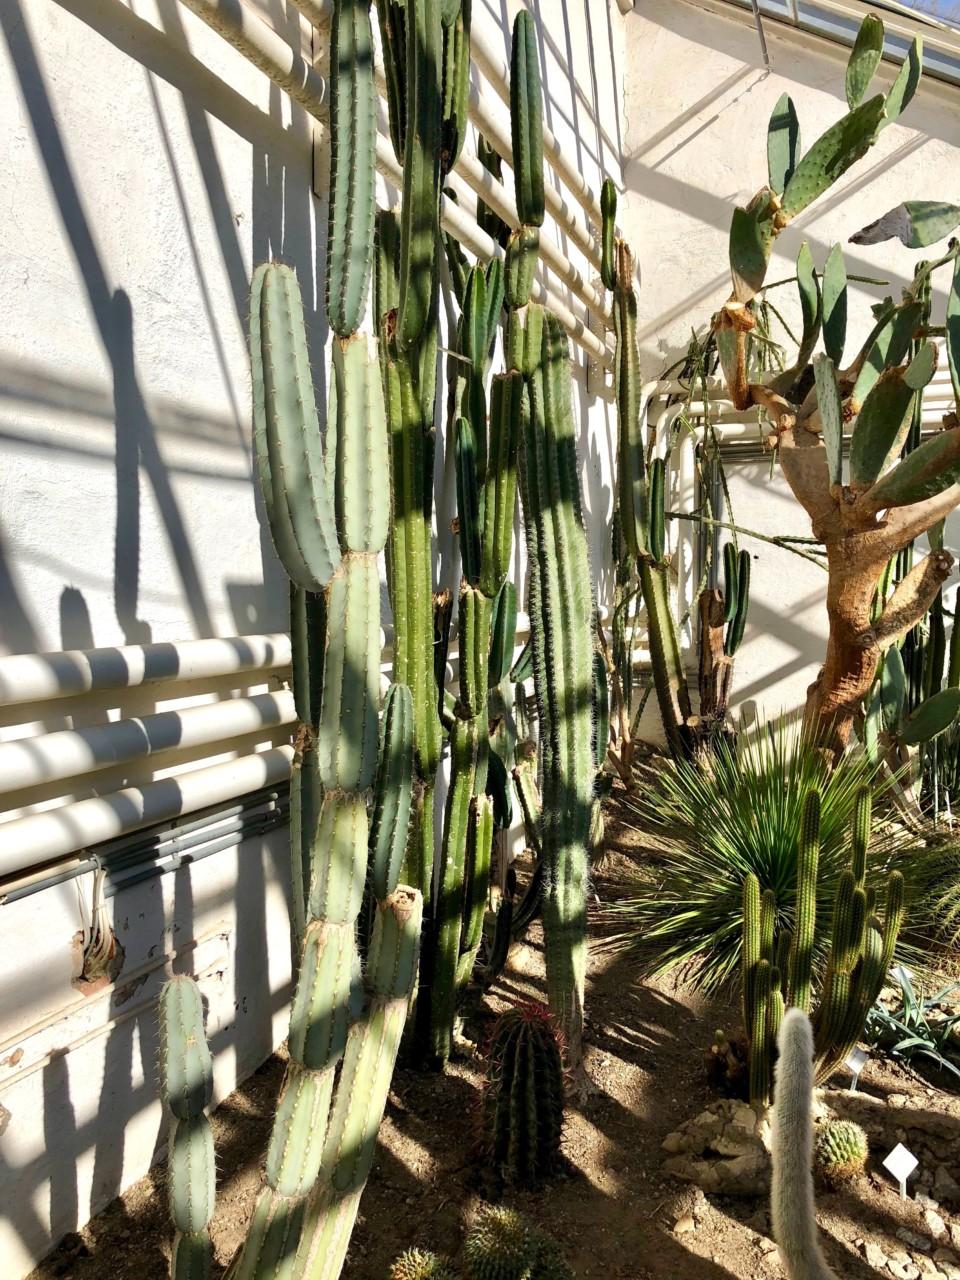 kaktus-botanisk-hage-oslo-palmehuset-green-house